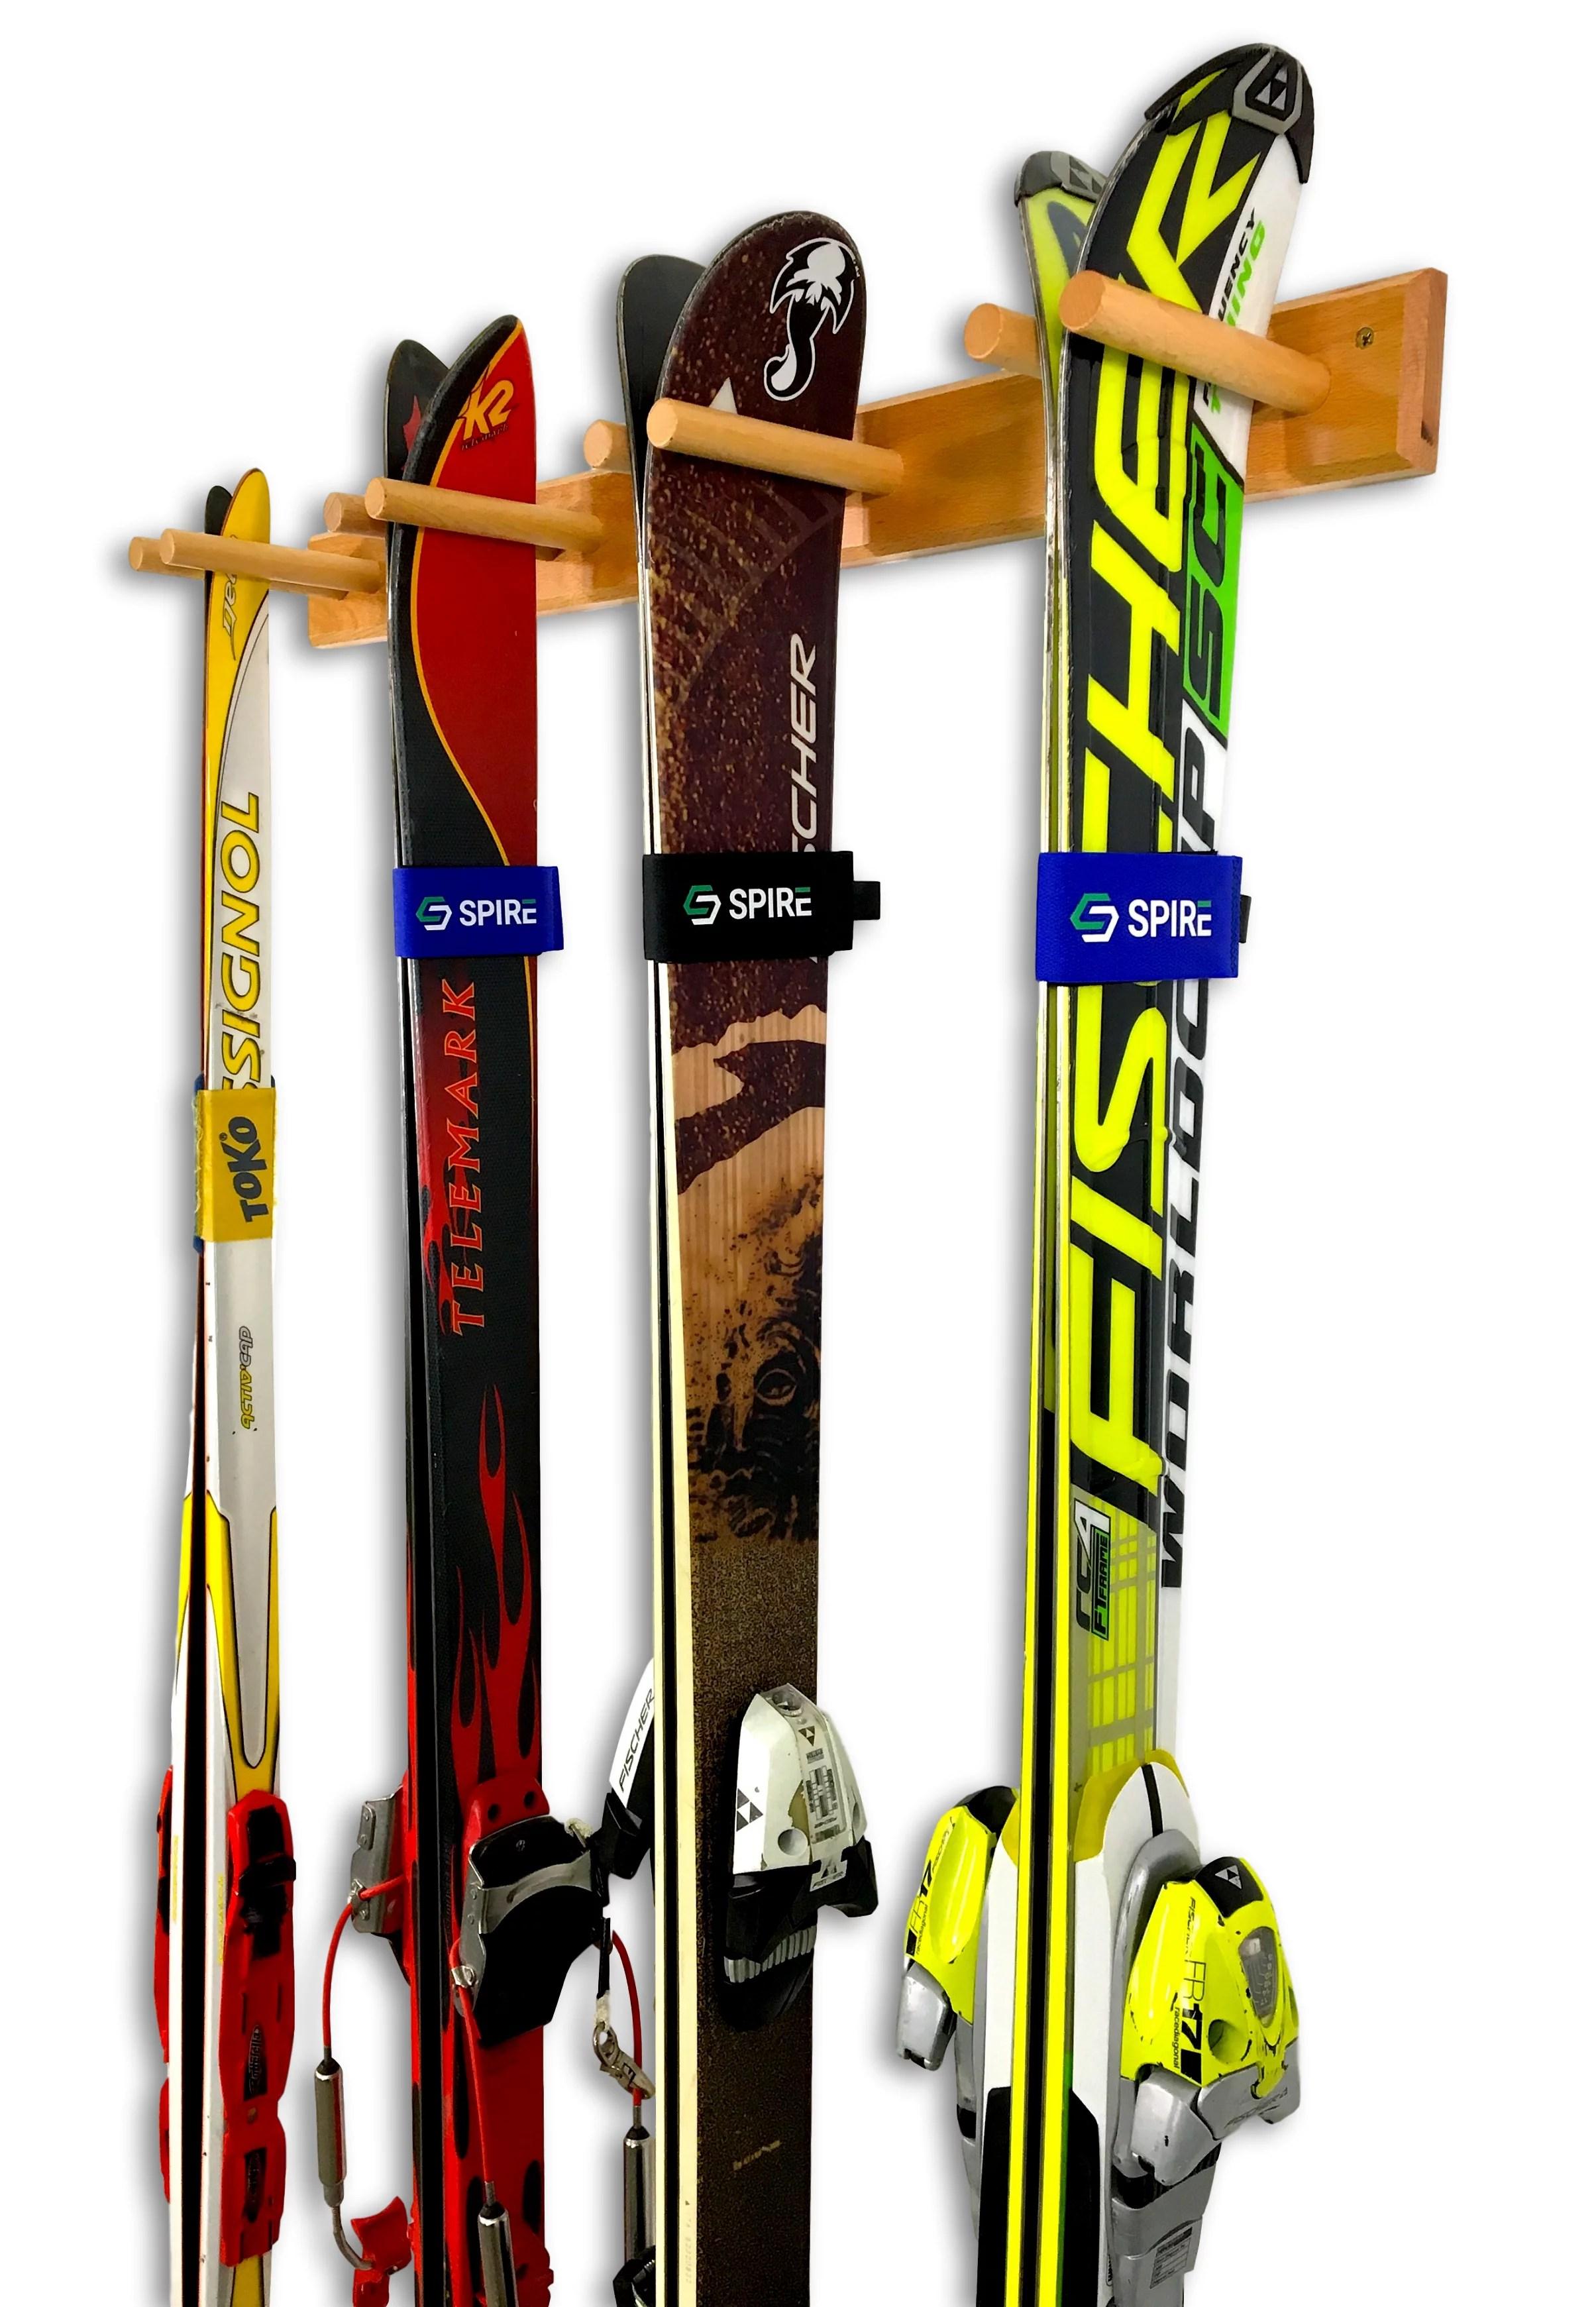 timber ski wall rack wood home garage mount system natural